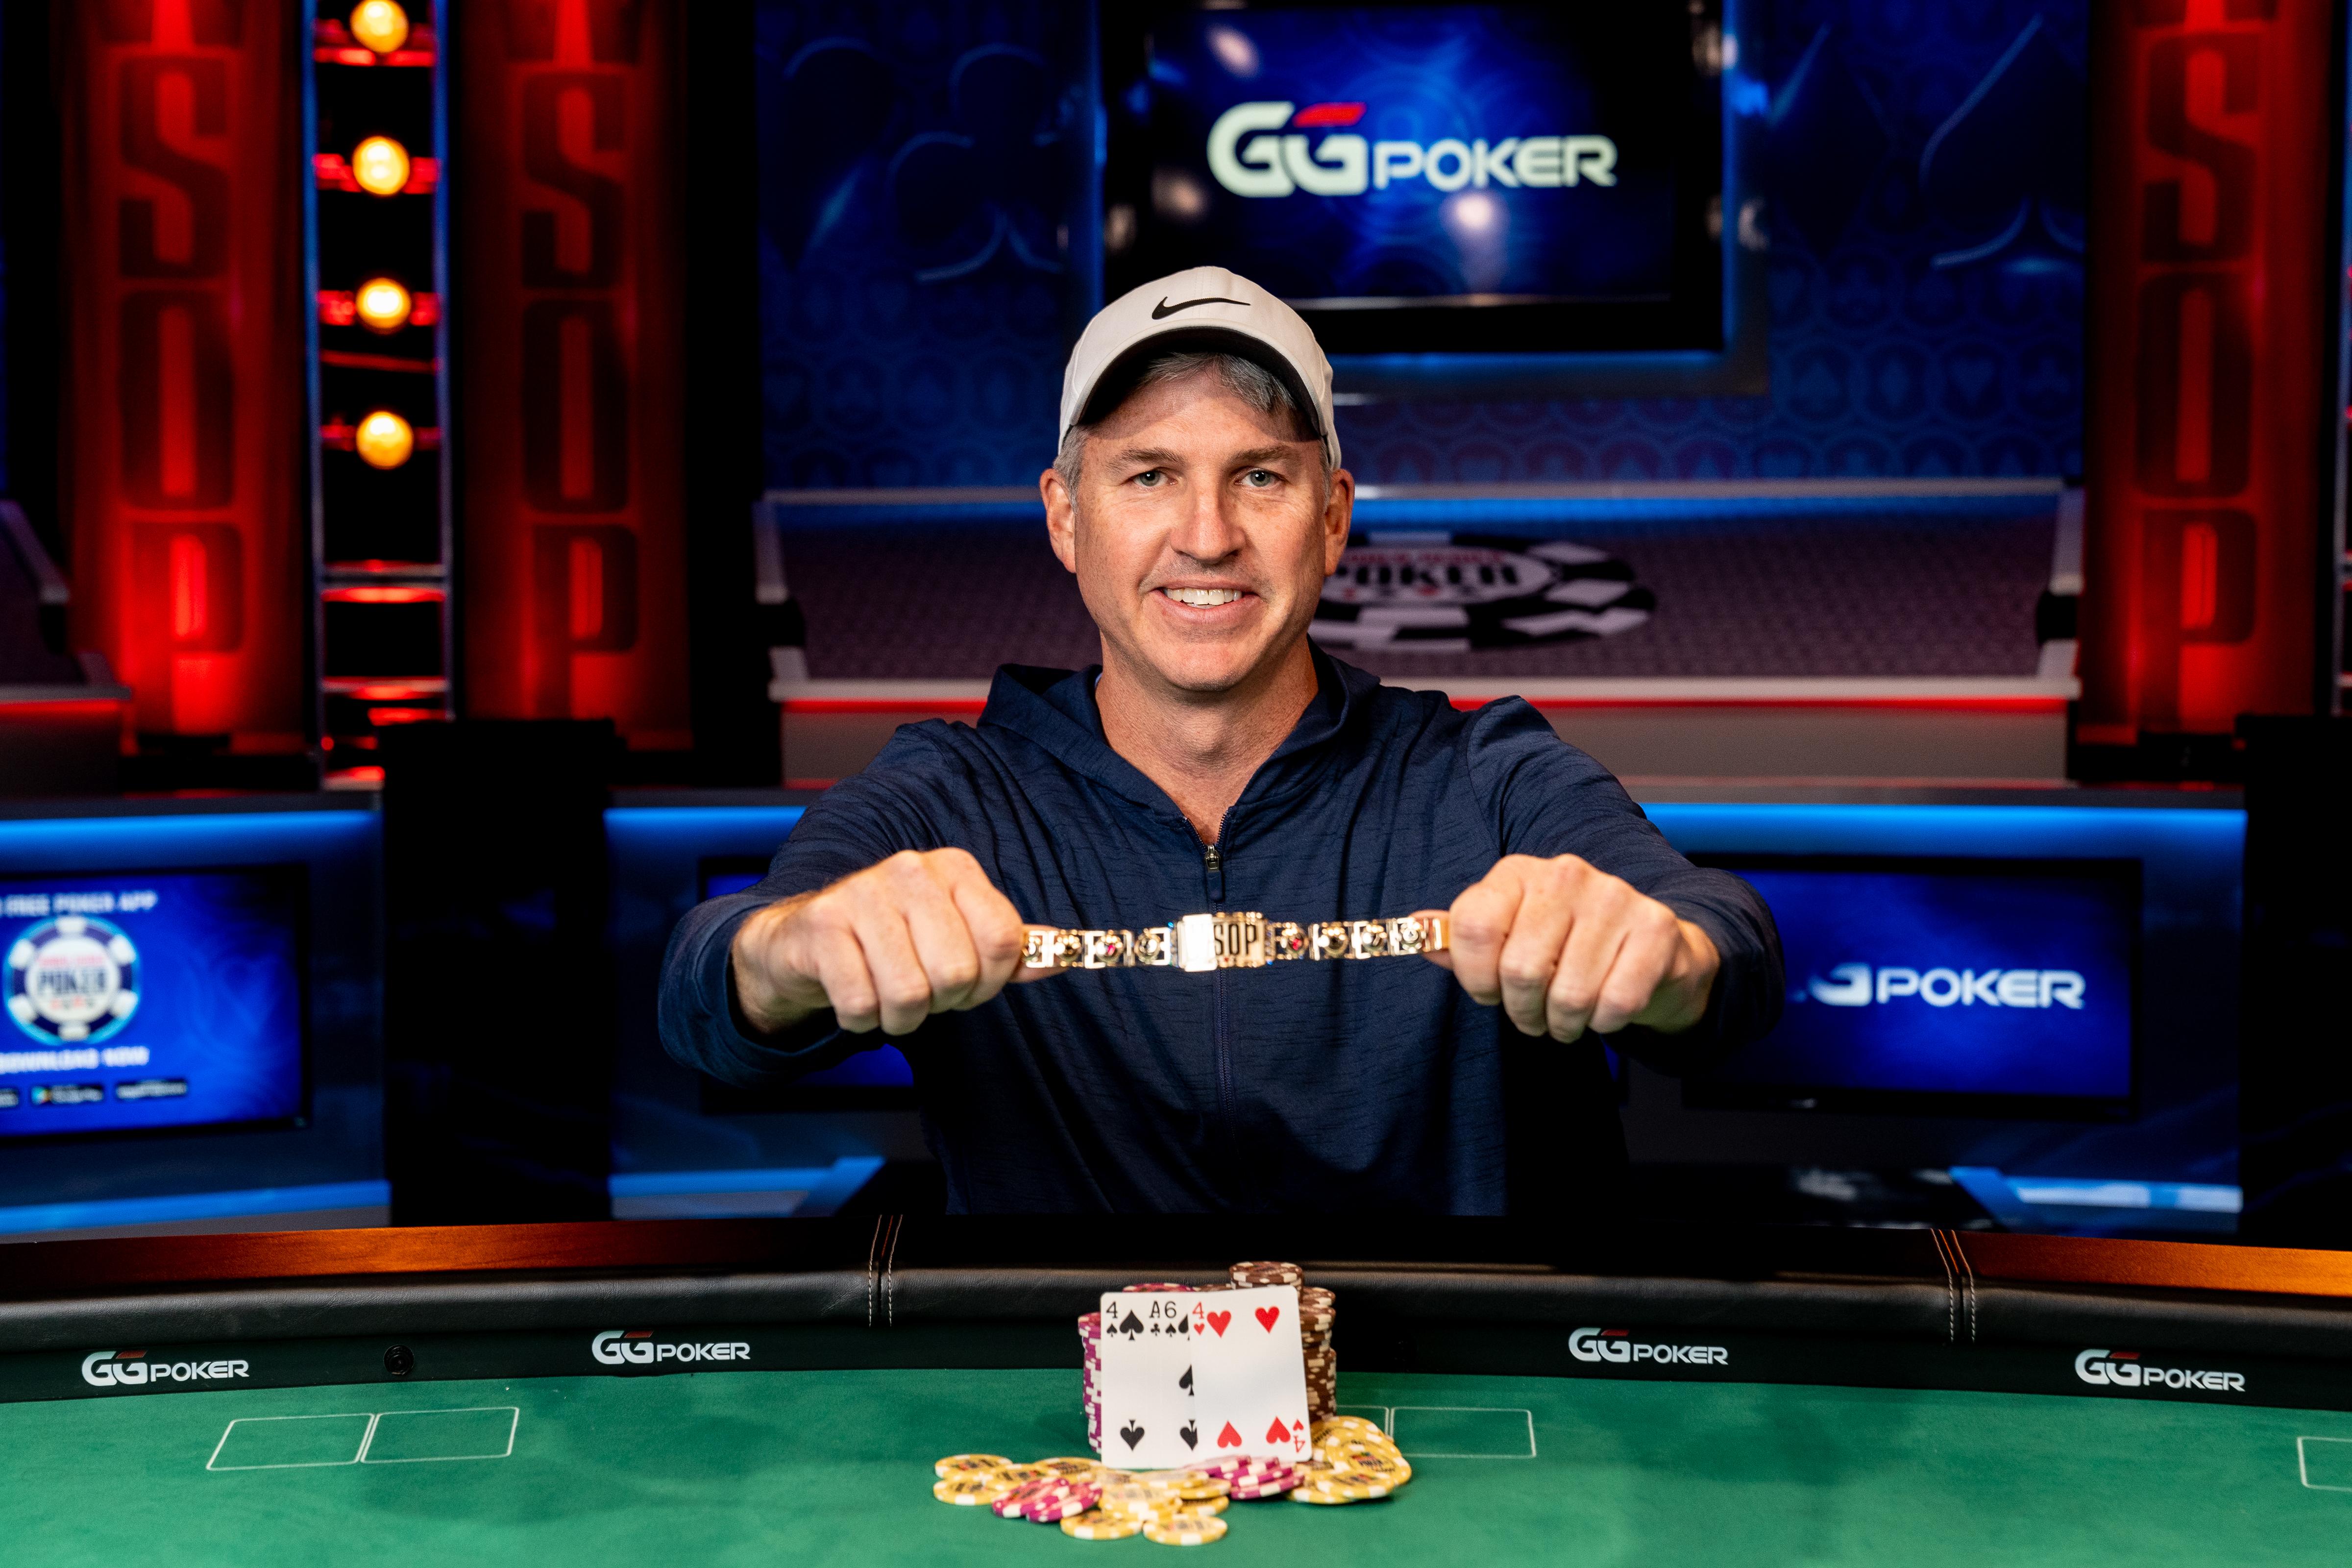 WSOP - Michael Prendergast